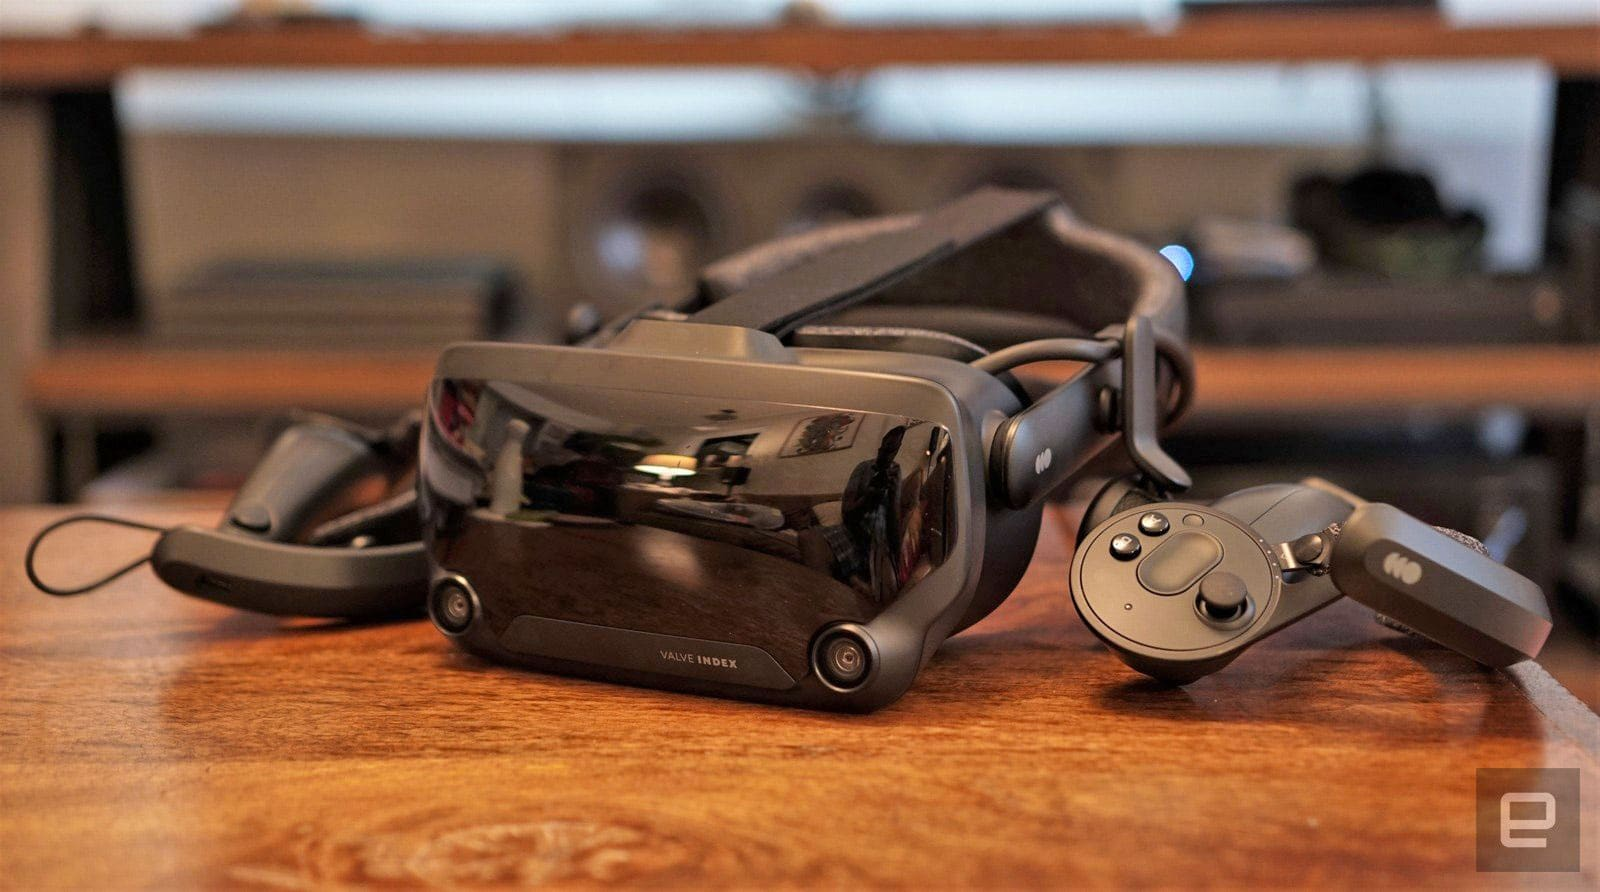 Valve Index hands-on: Impressive, expensive, inconvenient VR